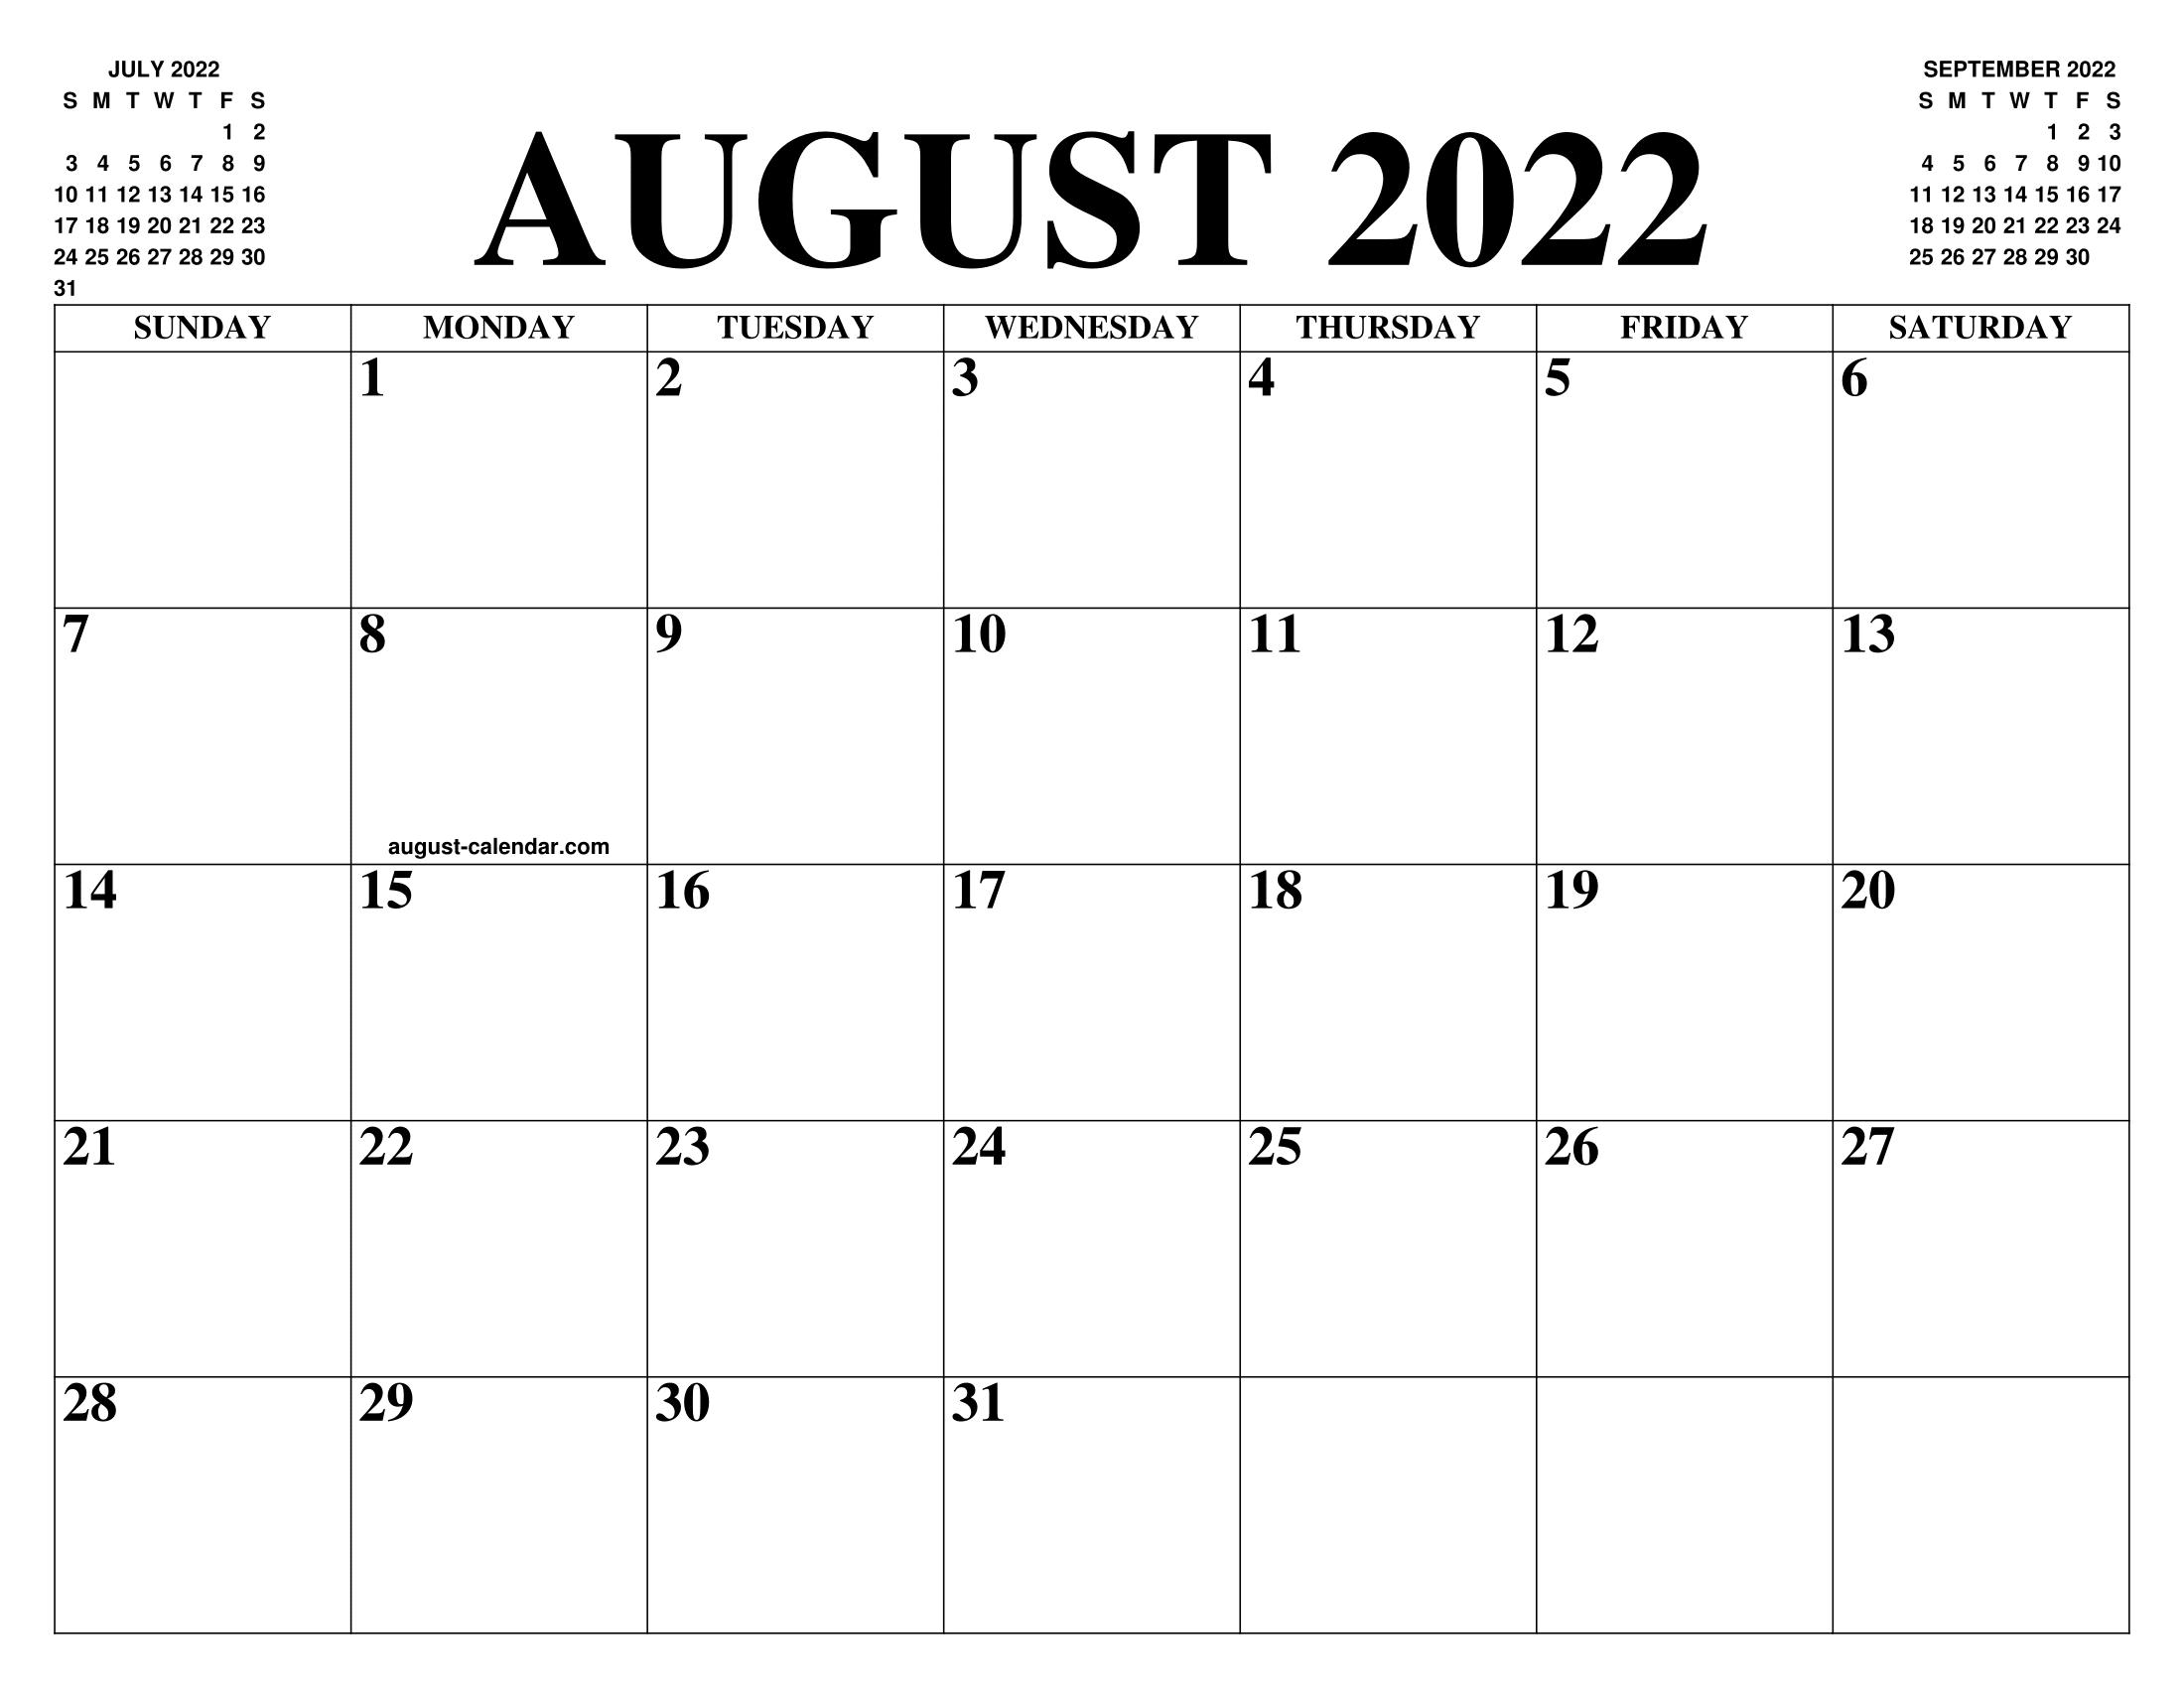 August Printable Calendar 2022.August 2022 Calendar Of The Month Free Printable August Calendar Of The Year Agenda